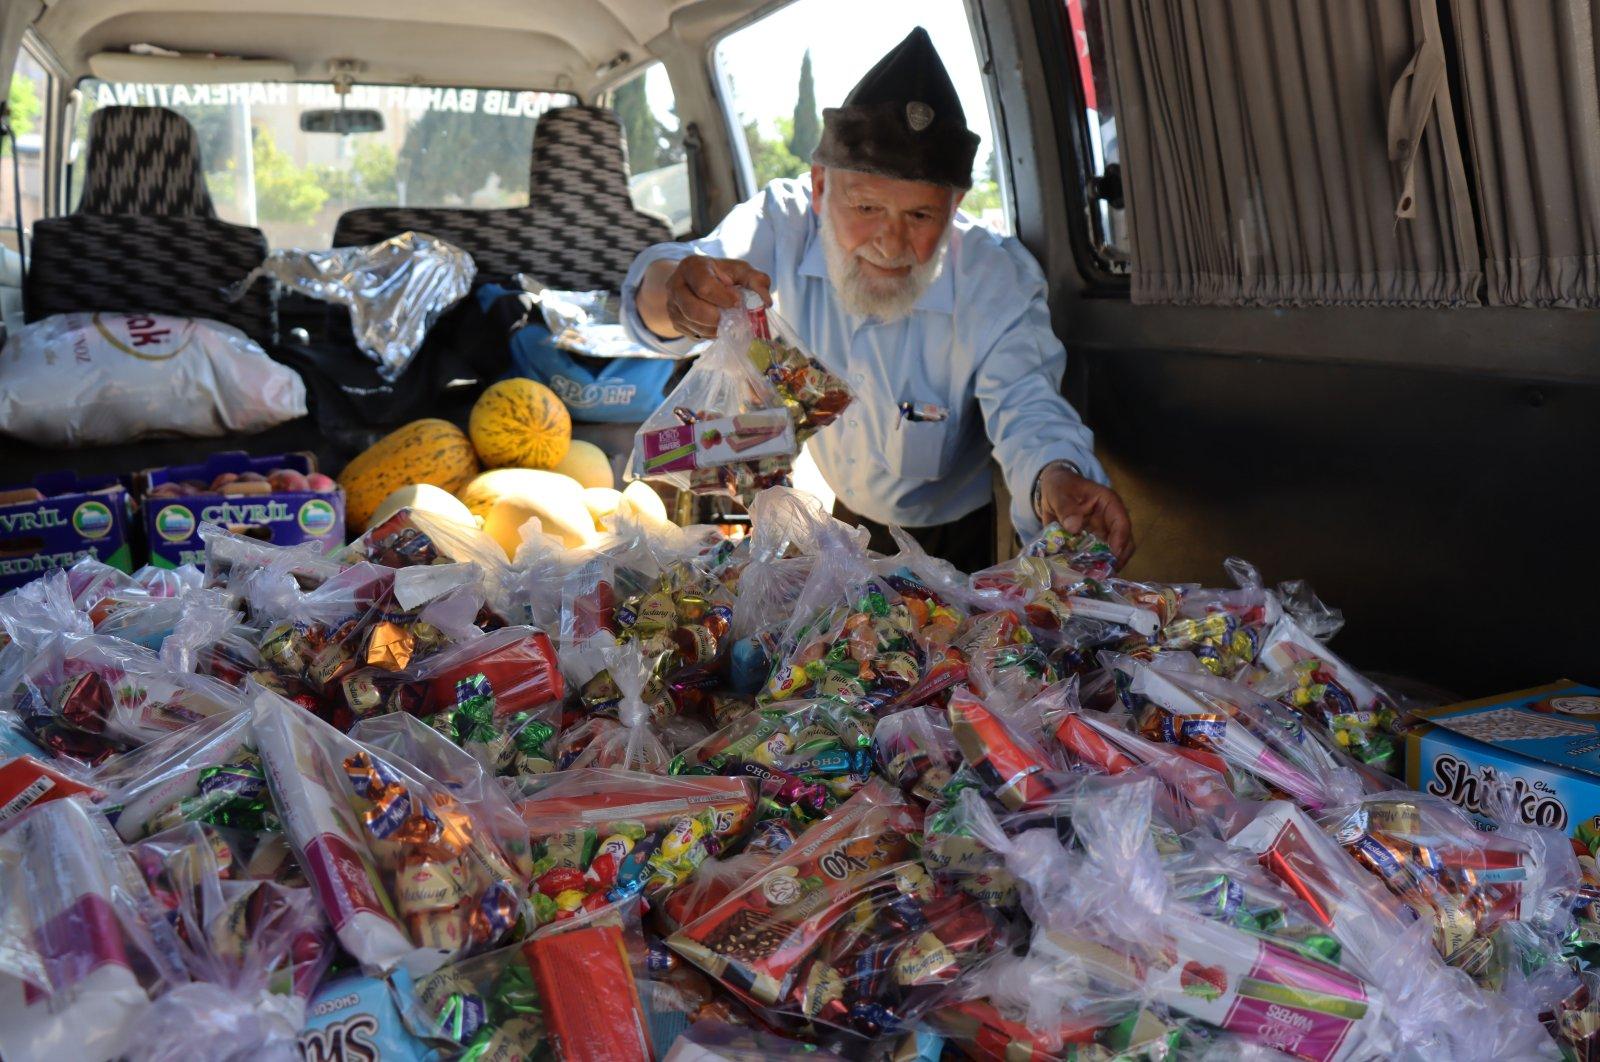 Muhammet Yılmaz inside his van full of candies and fruits, in Kilis, southern Turkey, July 19, 2021. (AA PHOTO)